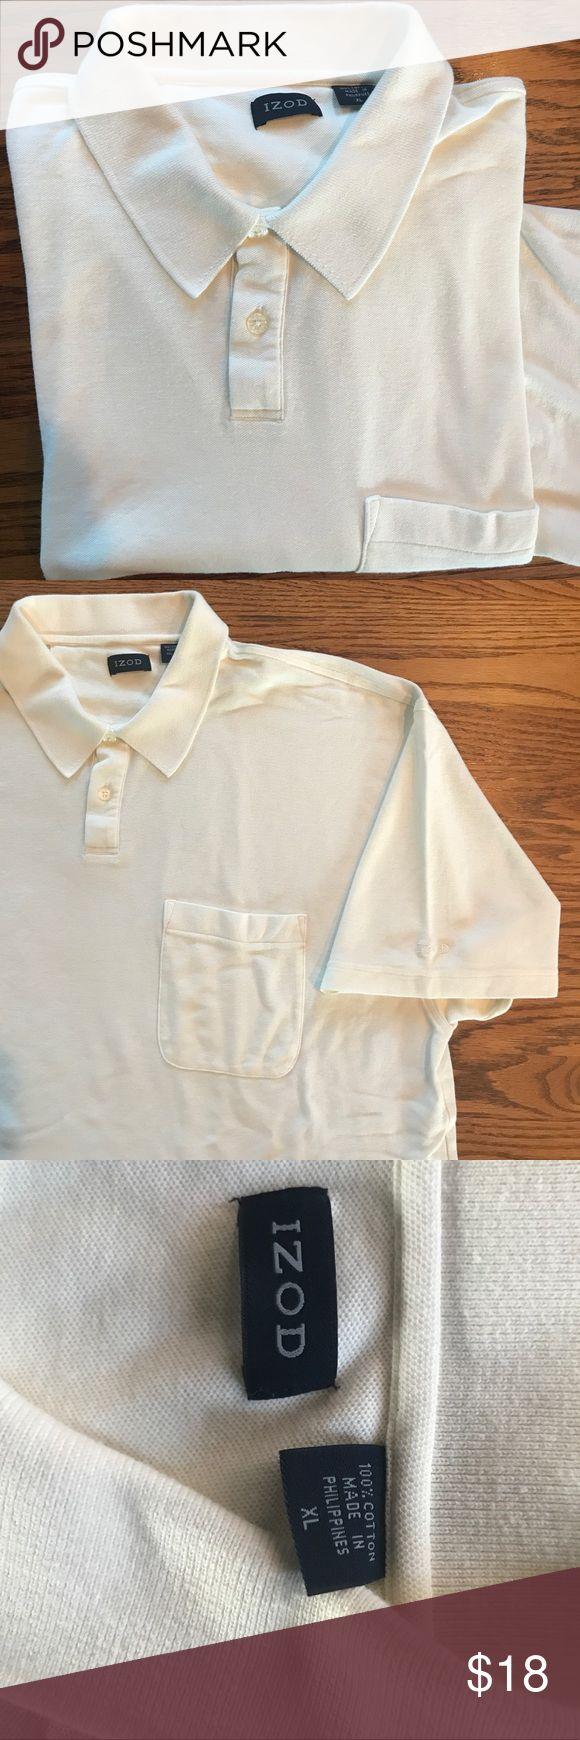 IZOD Golf Polo Shirt w/front Pocket, Logo Sleeve As new, IZOD brand polo golf shirt. 100% cotton, size XL. Never worn, laundered once. IZOD Shirts Polos